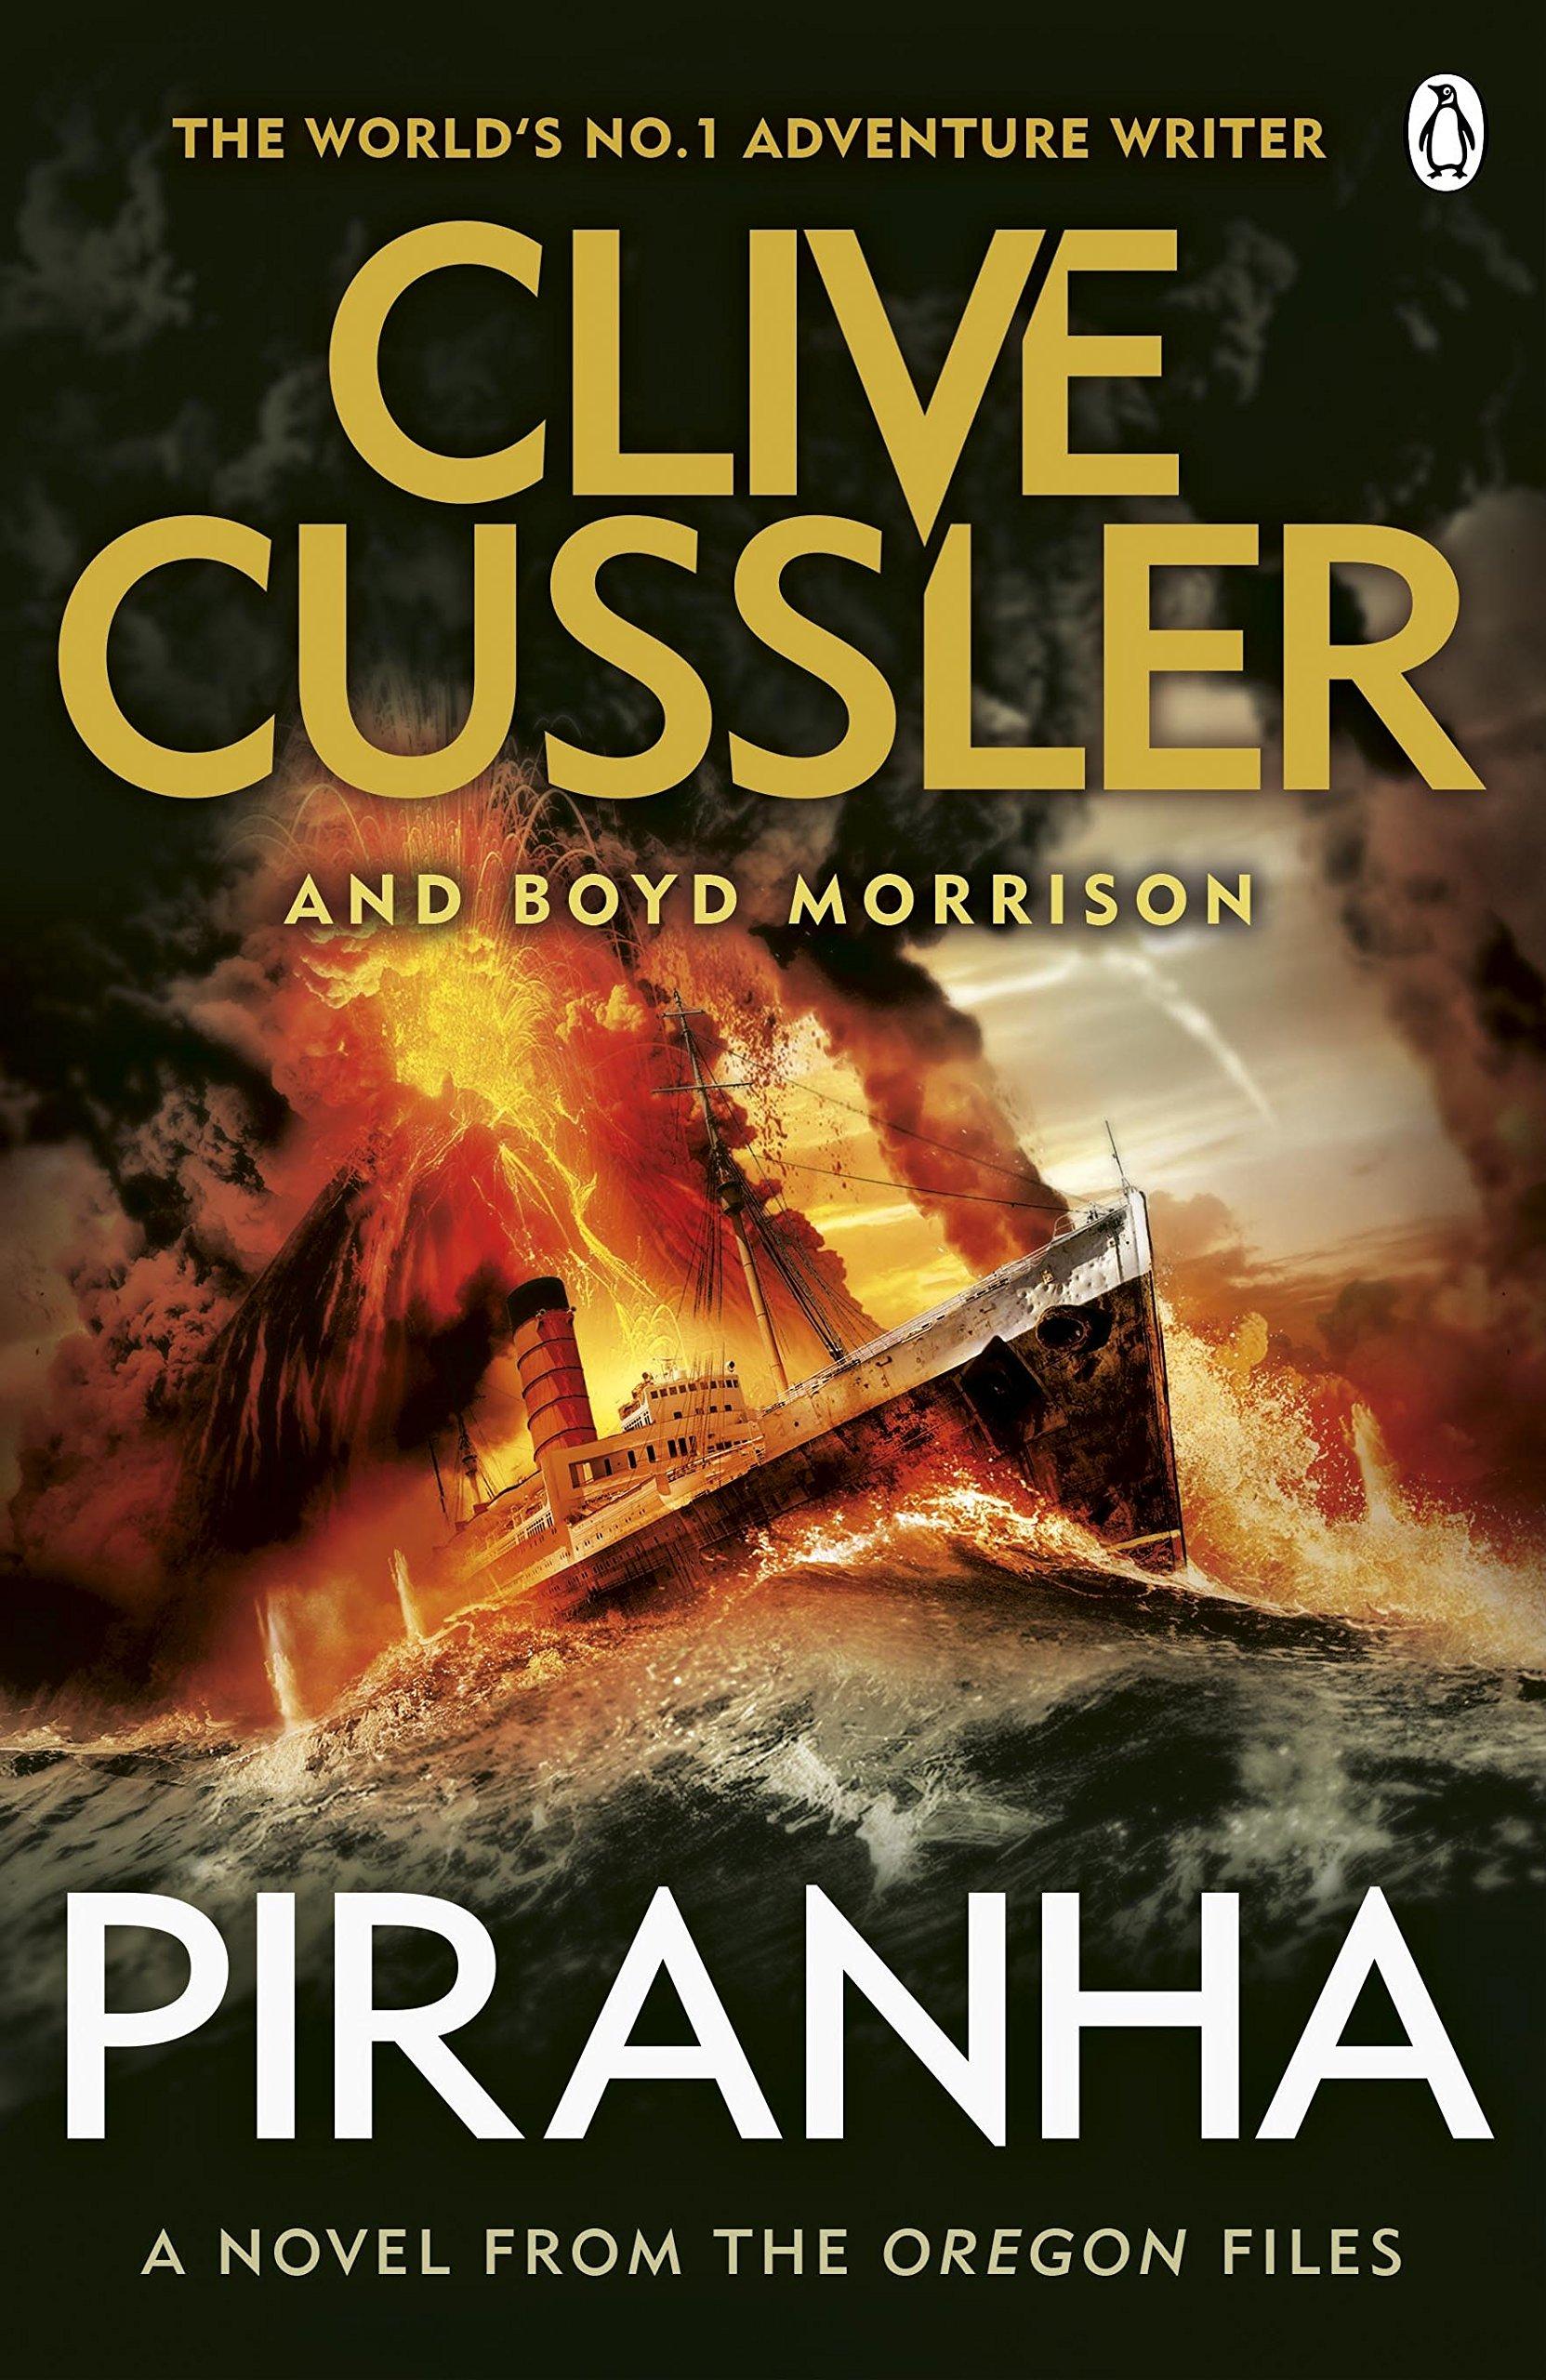 Piranha: Oregon Files #10 (The Oregon Files): Amazon.co.uk: Clive Cussler,  Boyd Morrison: 9781405914437: Books